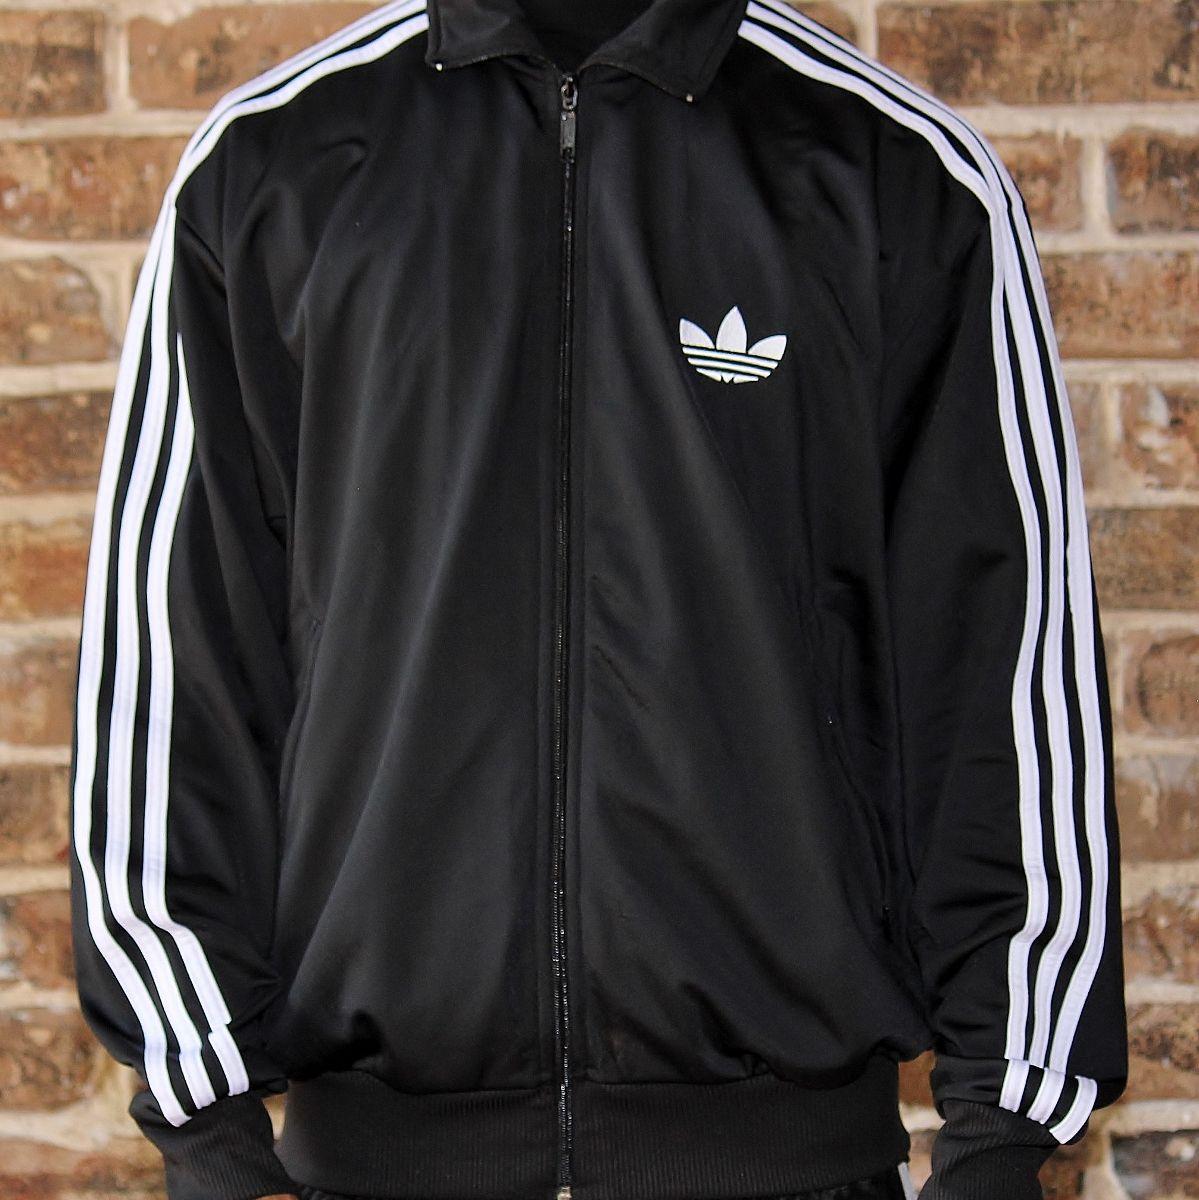 White with black stripes adidas hoodie jacket size Depop